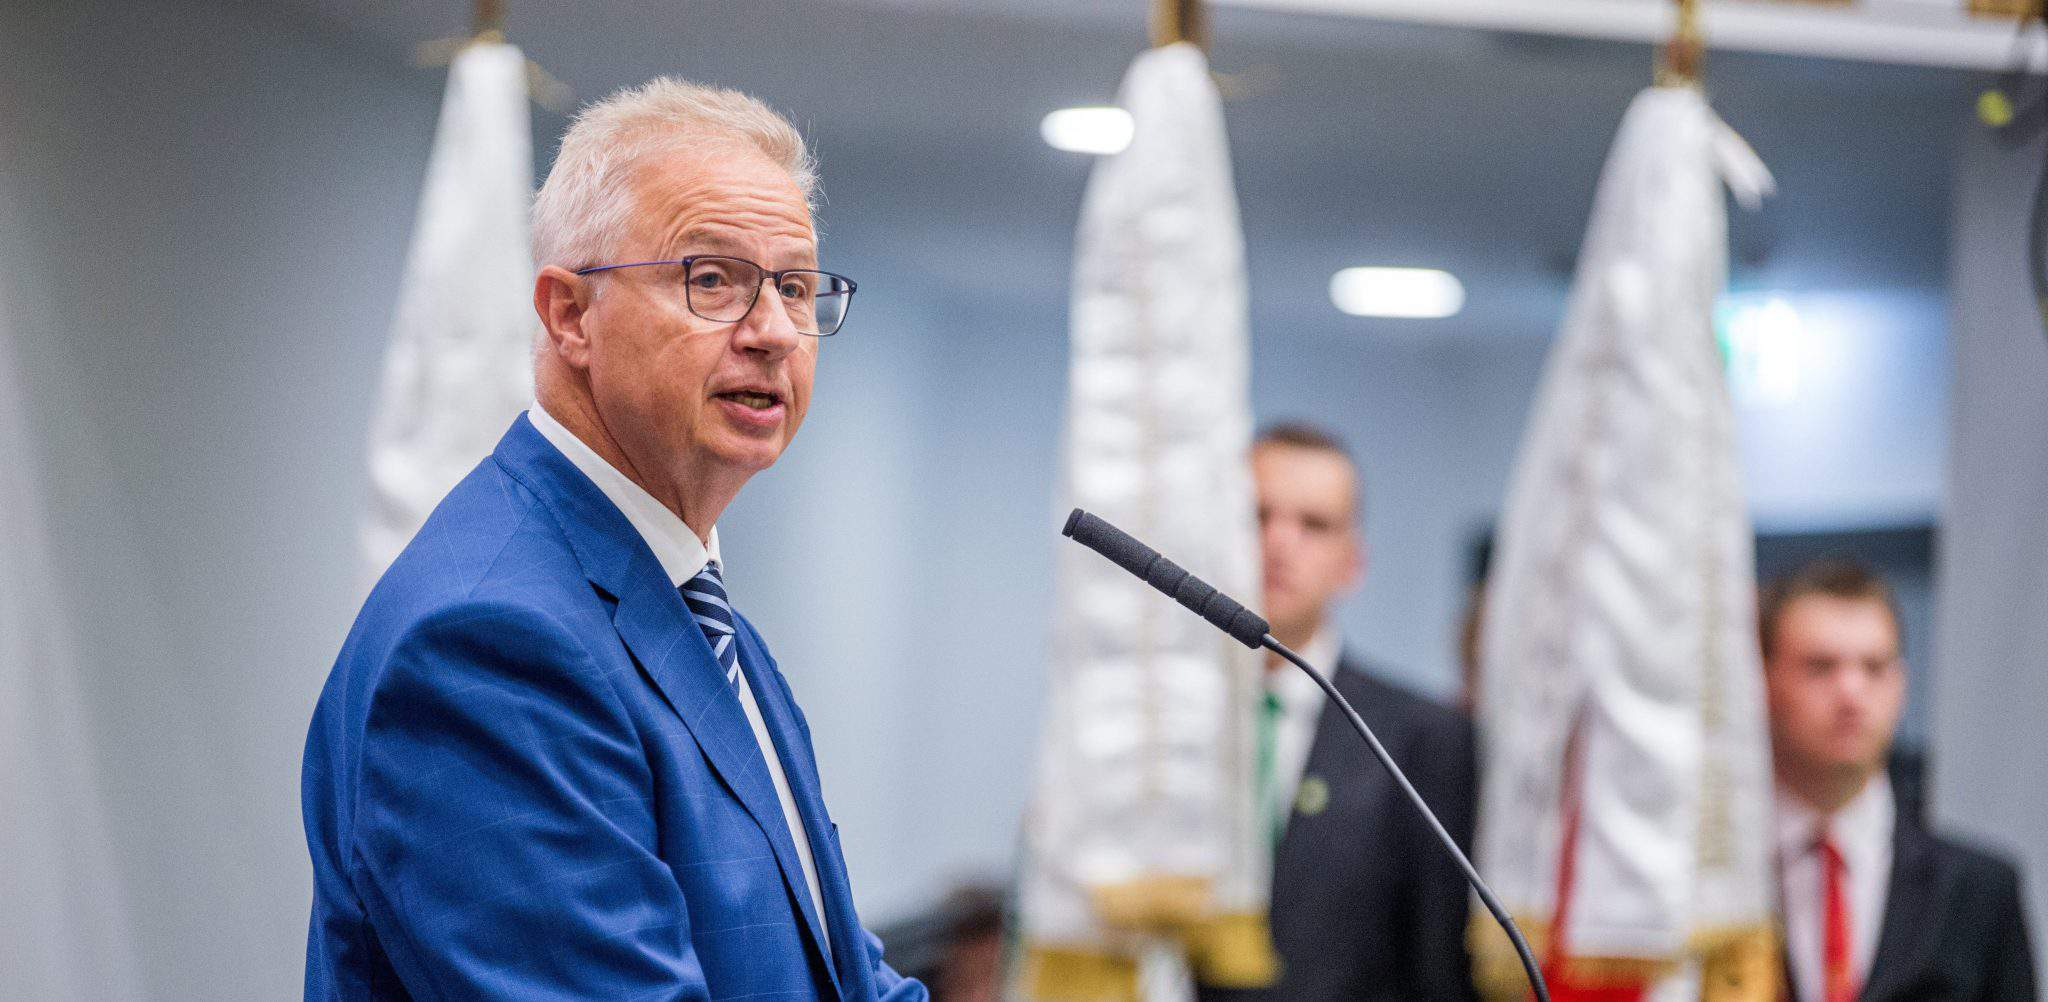 justice minister trócsányi